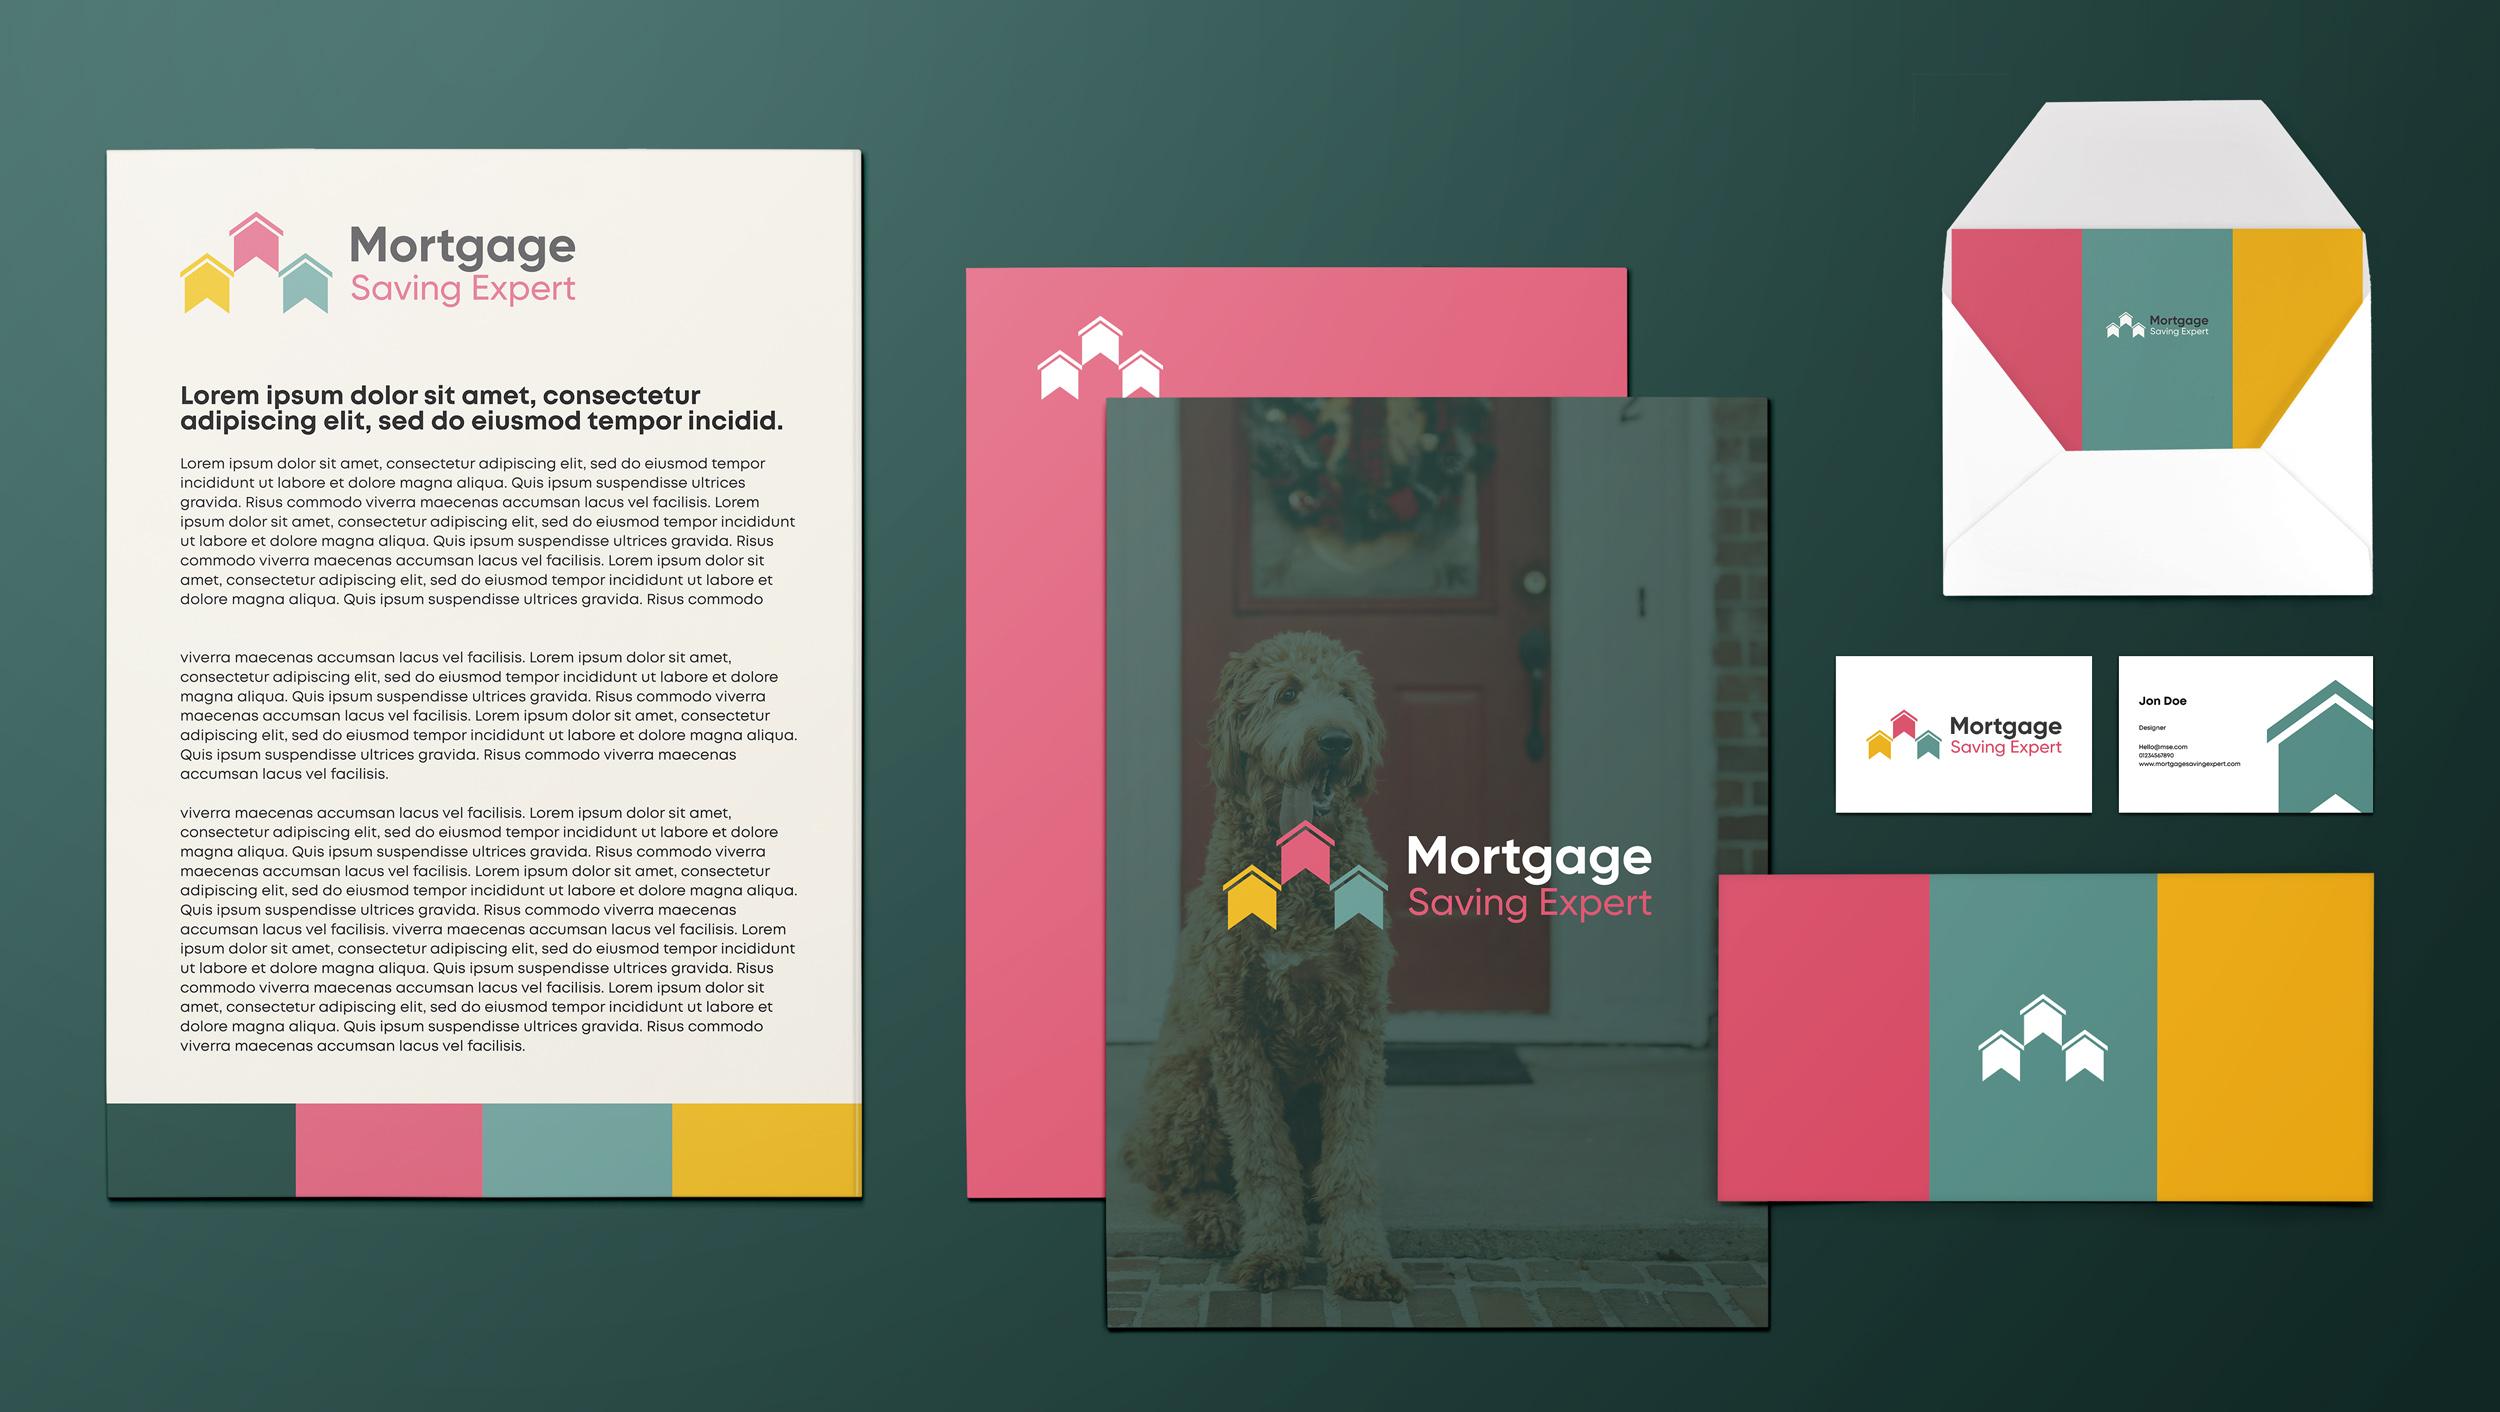 Mortgage Saving Expert